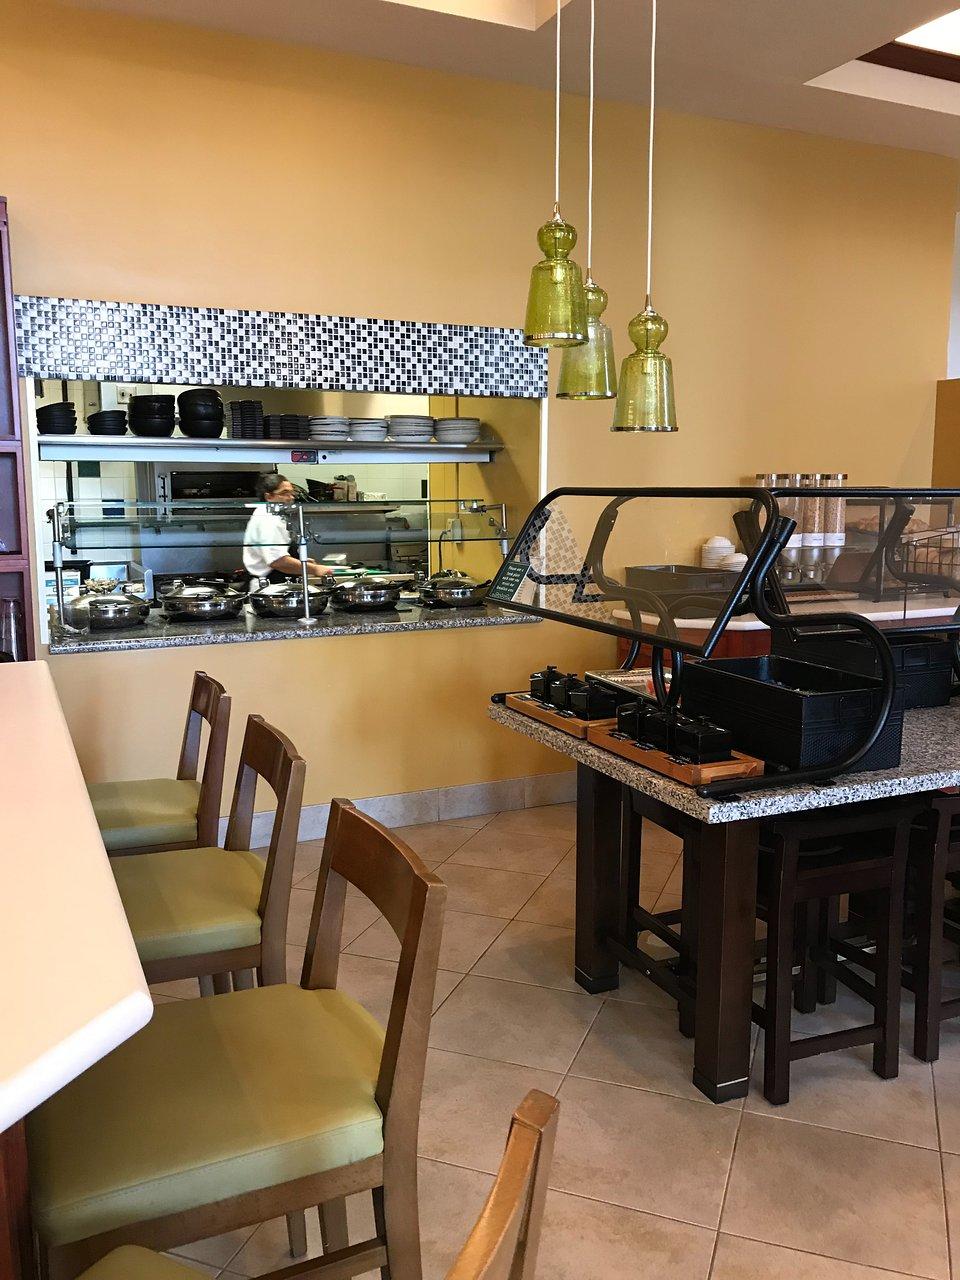 HILTON GARDEN INN CHARLOTTE UPTOWN (NC) - Hotel Reviews, Photos ...